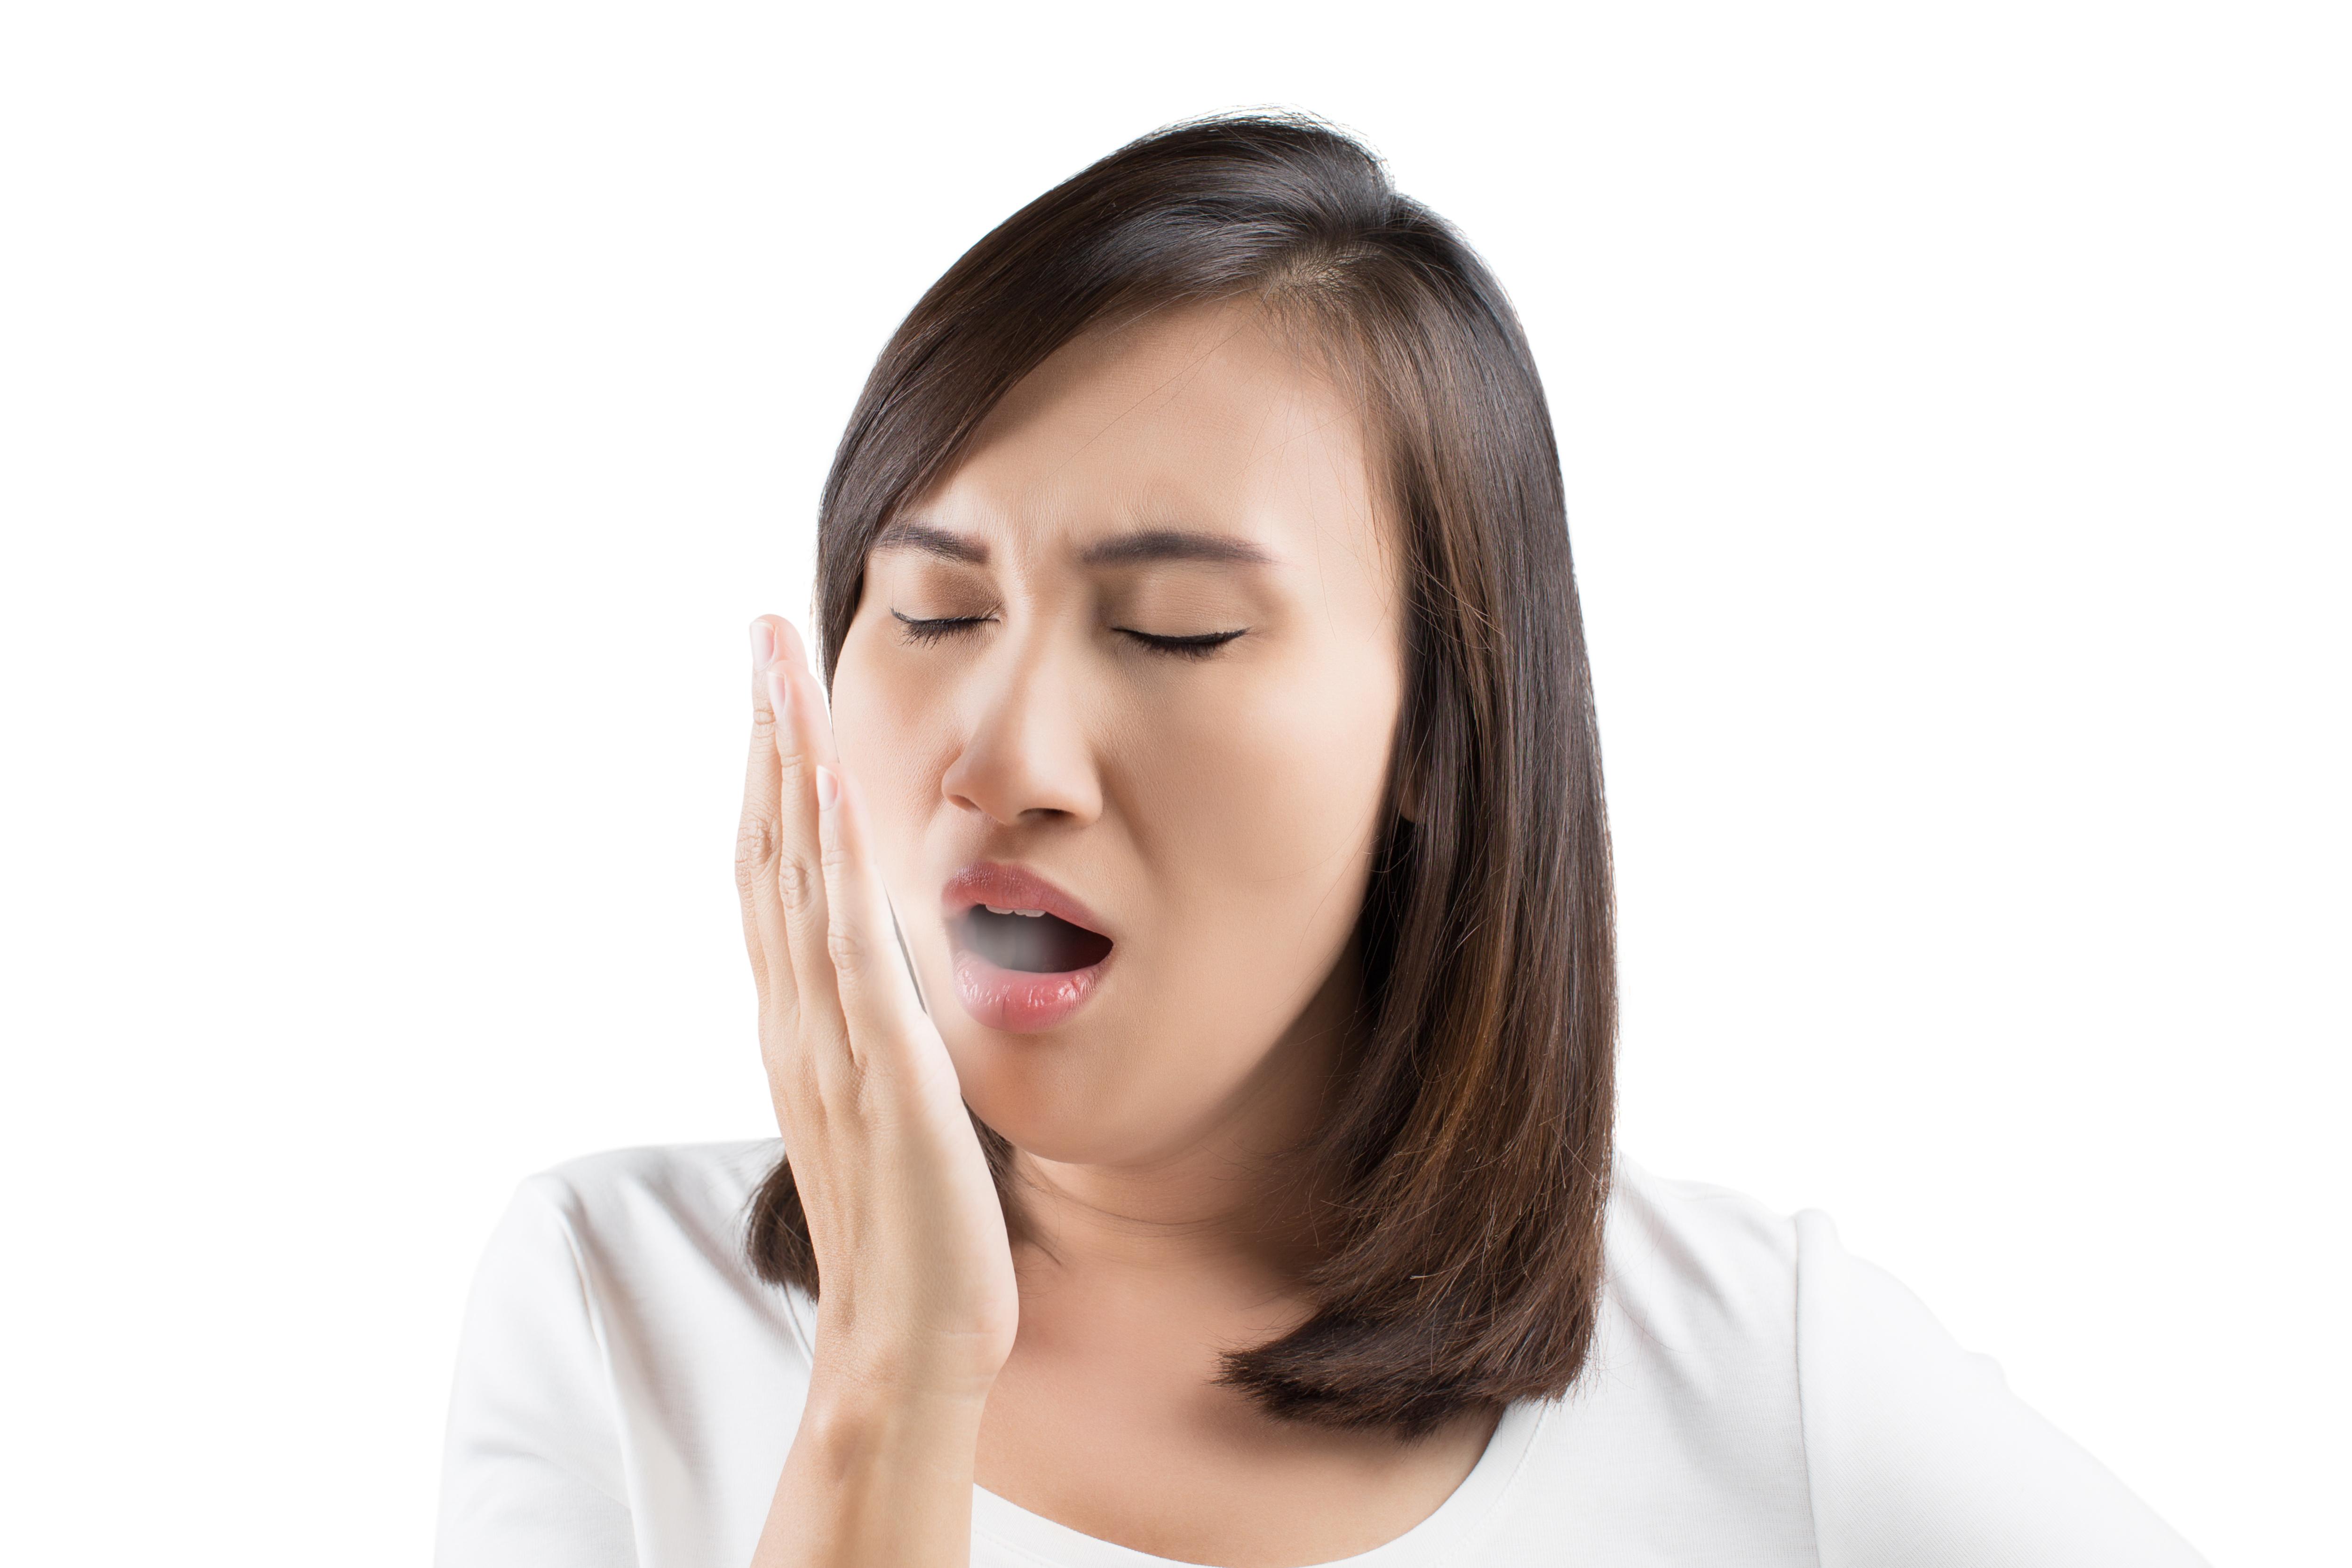 ce inseamna respiratia urat mirositoare